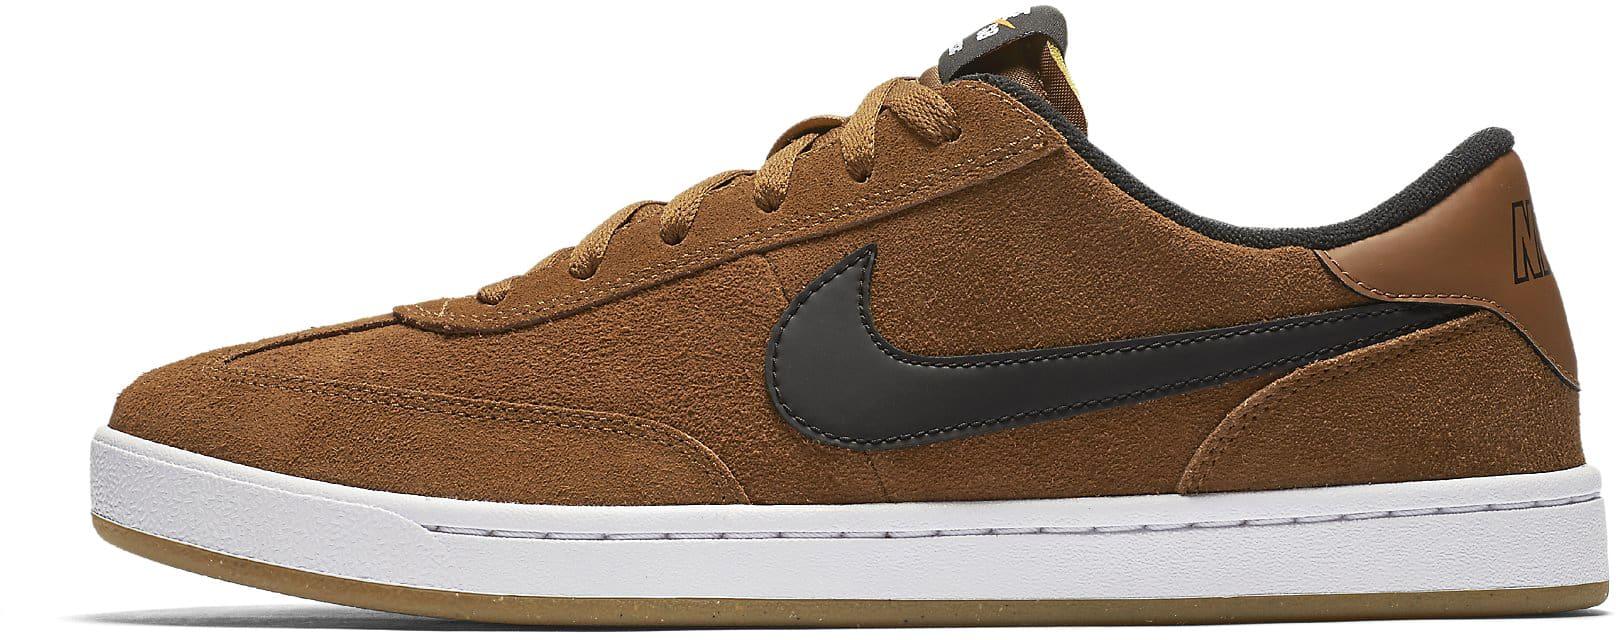 ac88424325a5 Nike SB FC Classic Skate Shoes - thumbnail 1